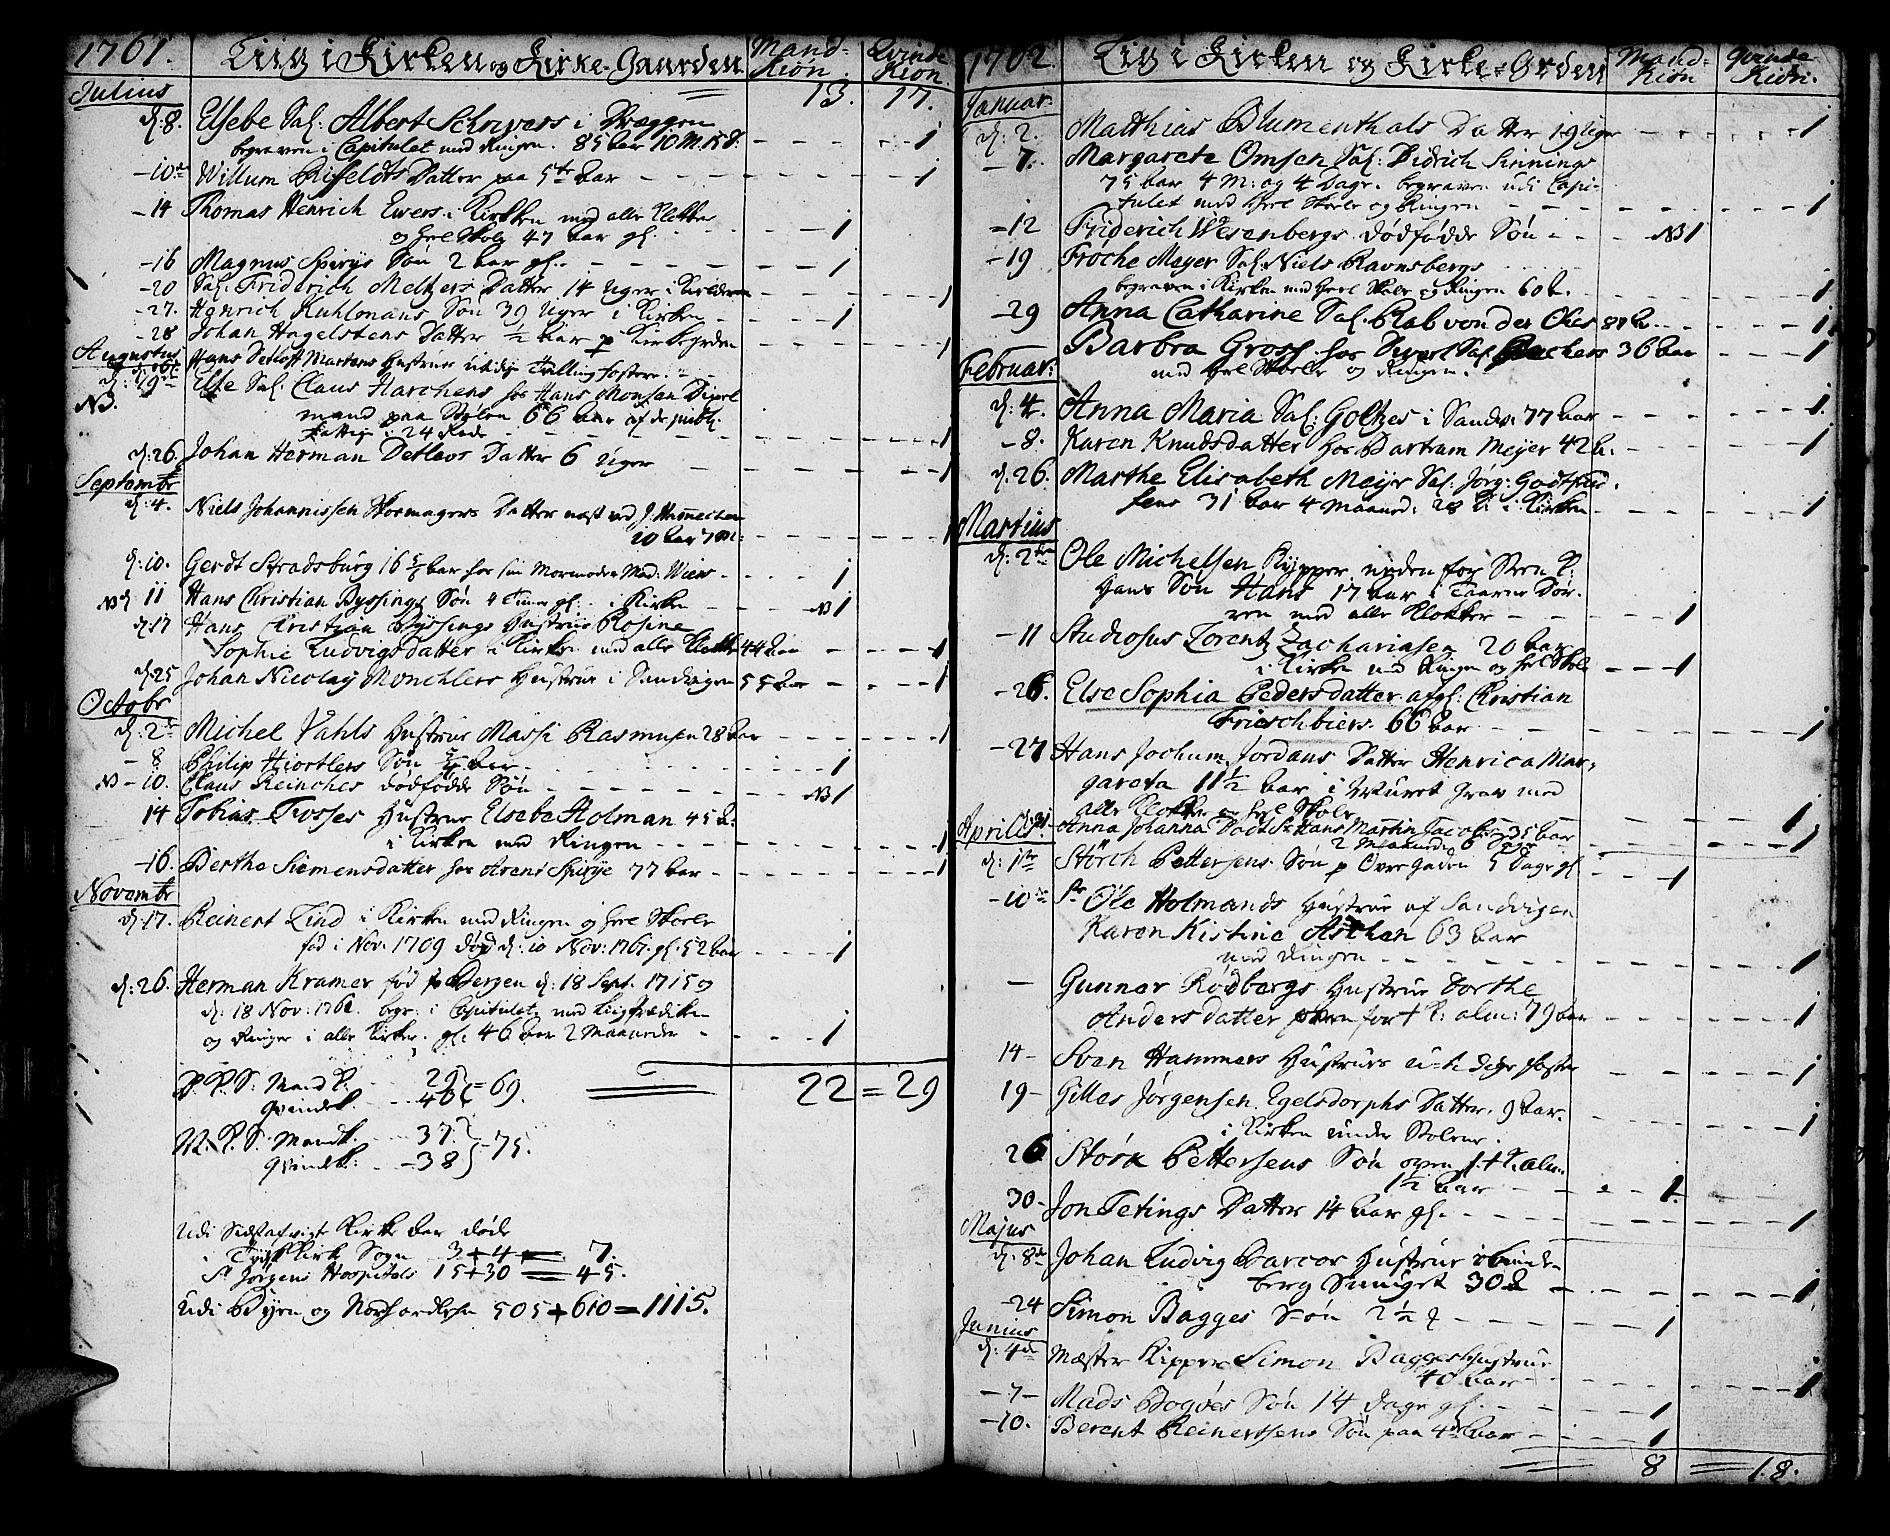 SAB, Korskirken Sokneprestembete, H/Haa/L0011: Ministerialbok nr. A 11, 1731-1785, s. 160